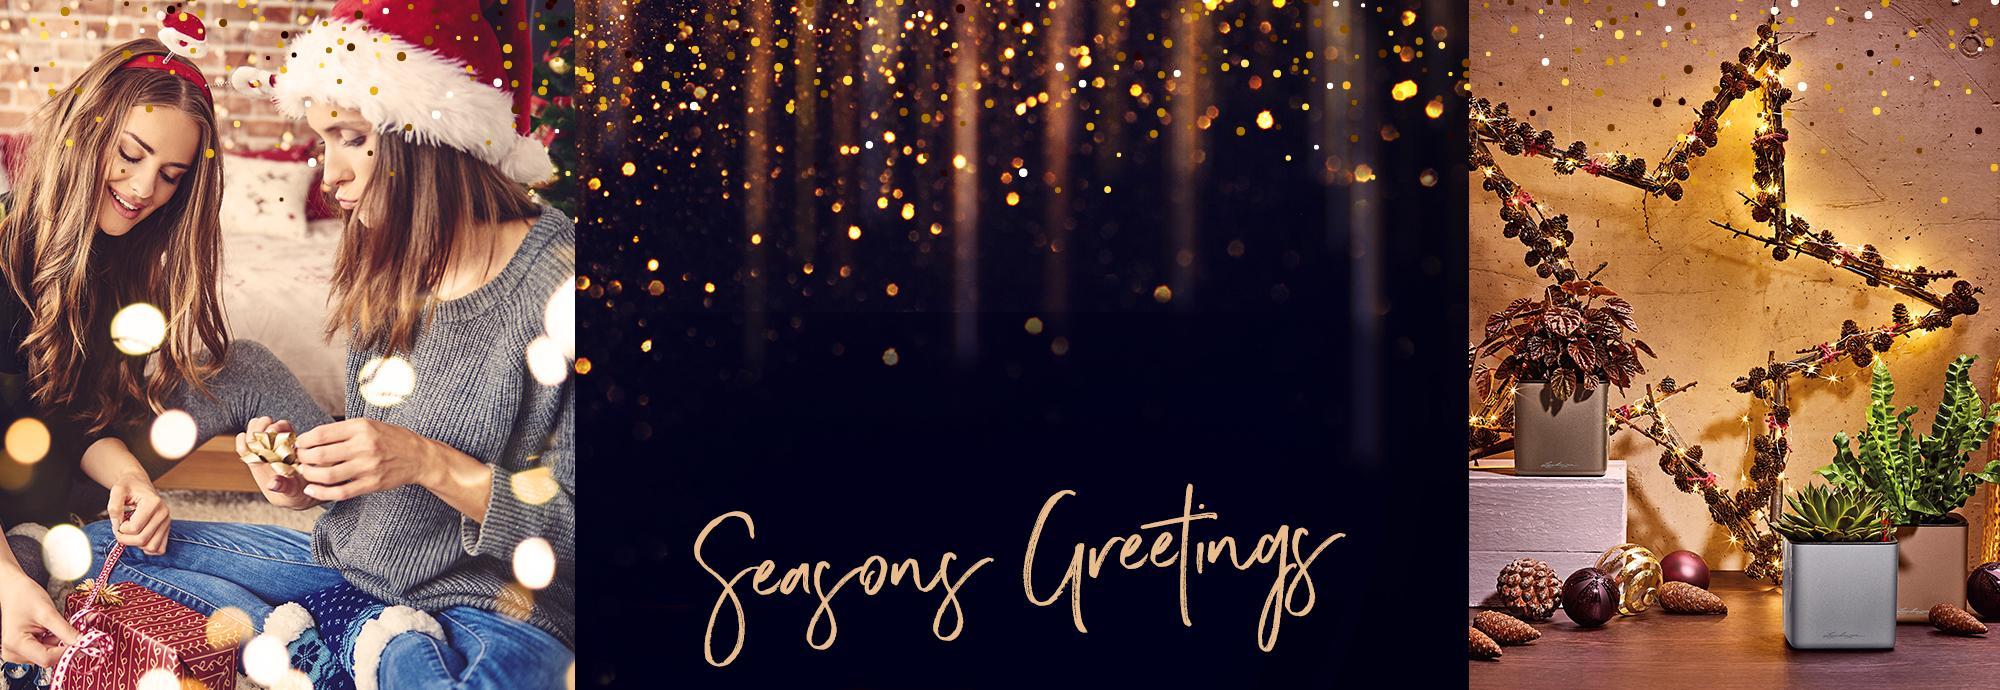 hero_banner_tw_seasons-greetings_de